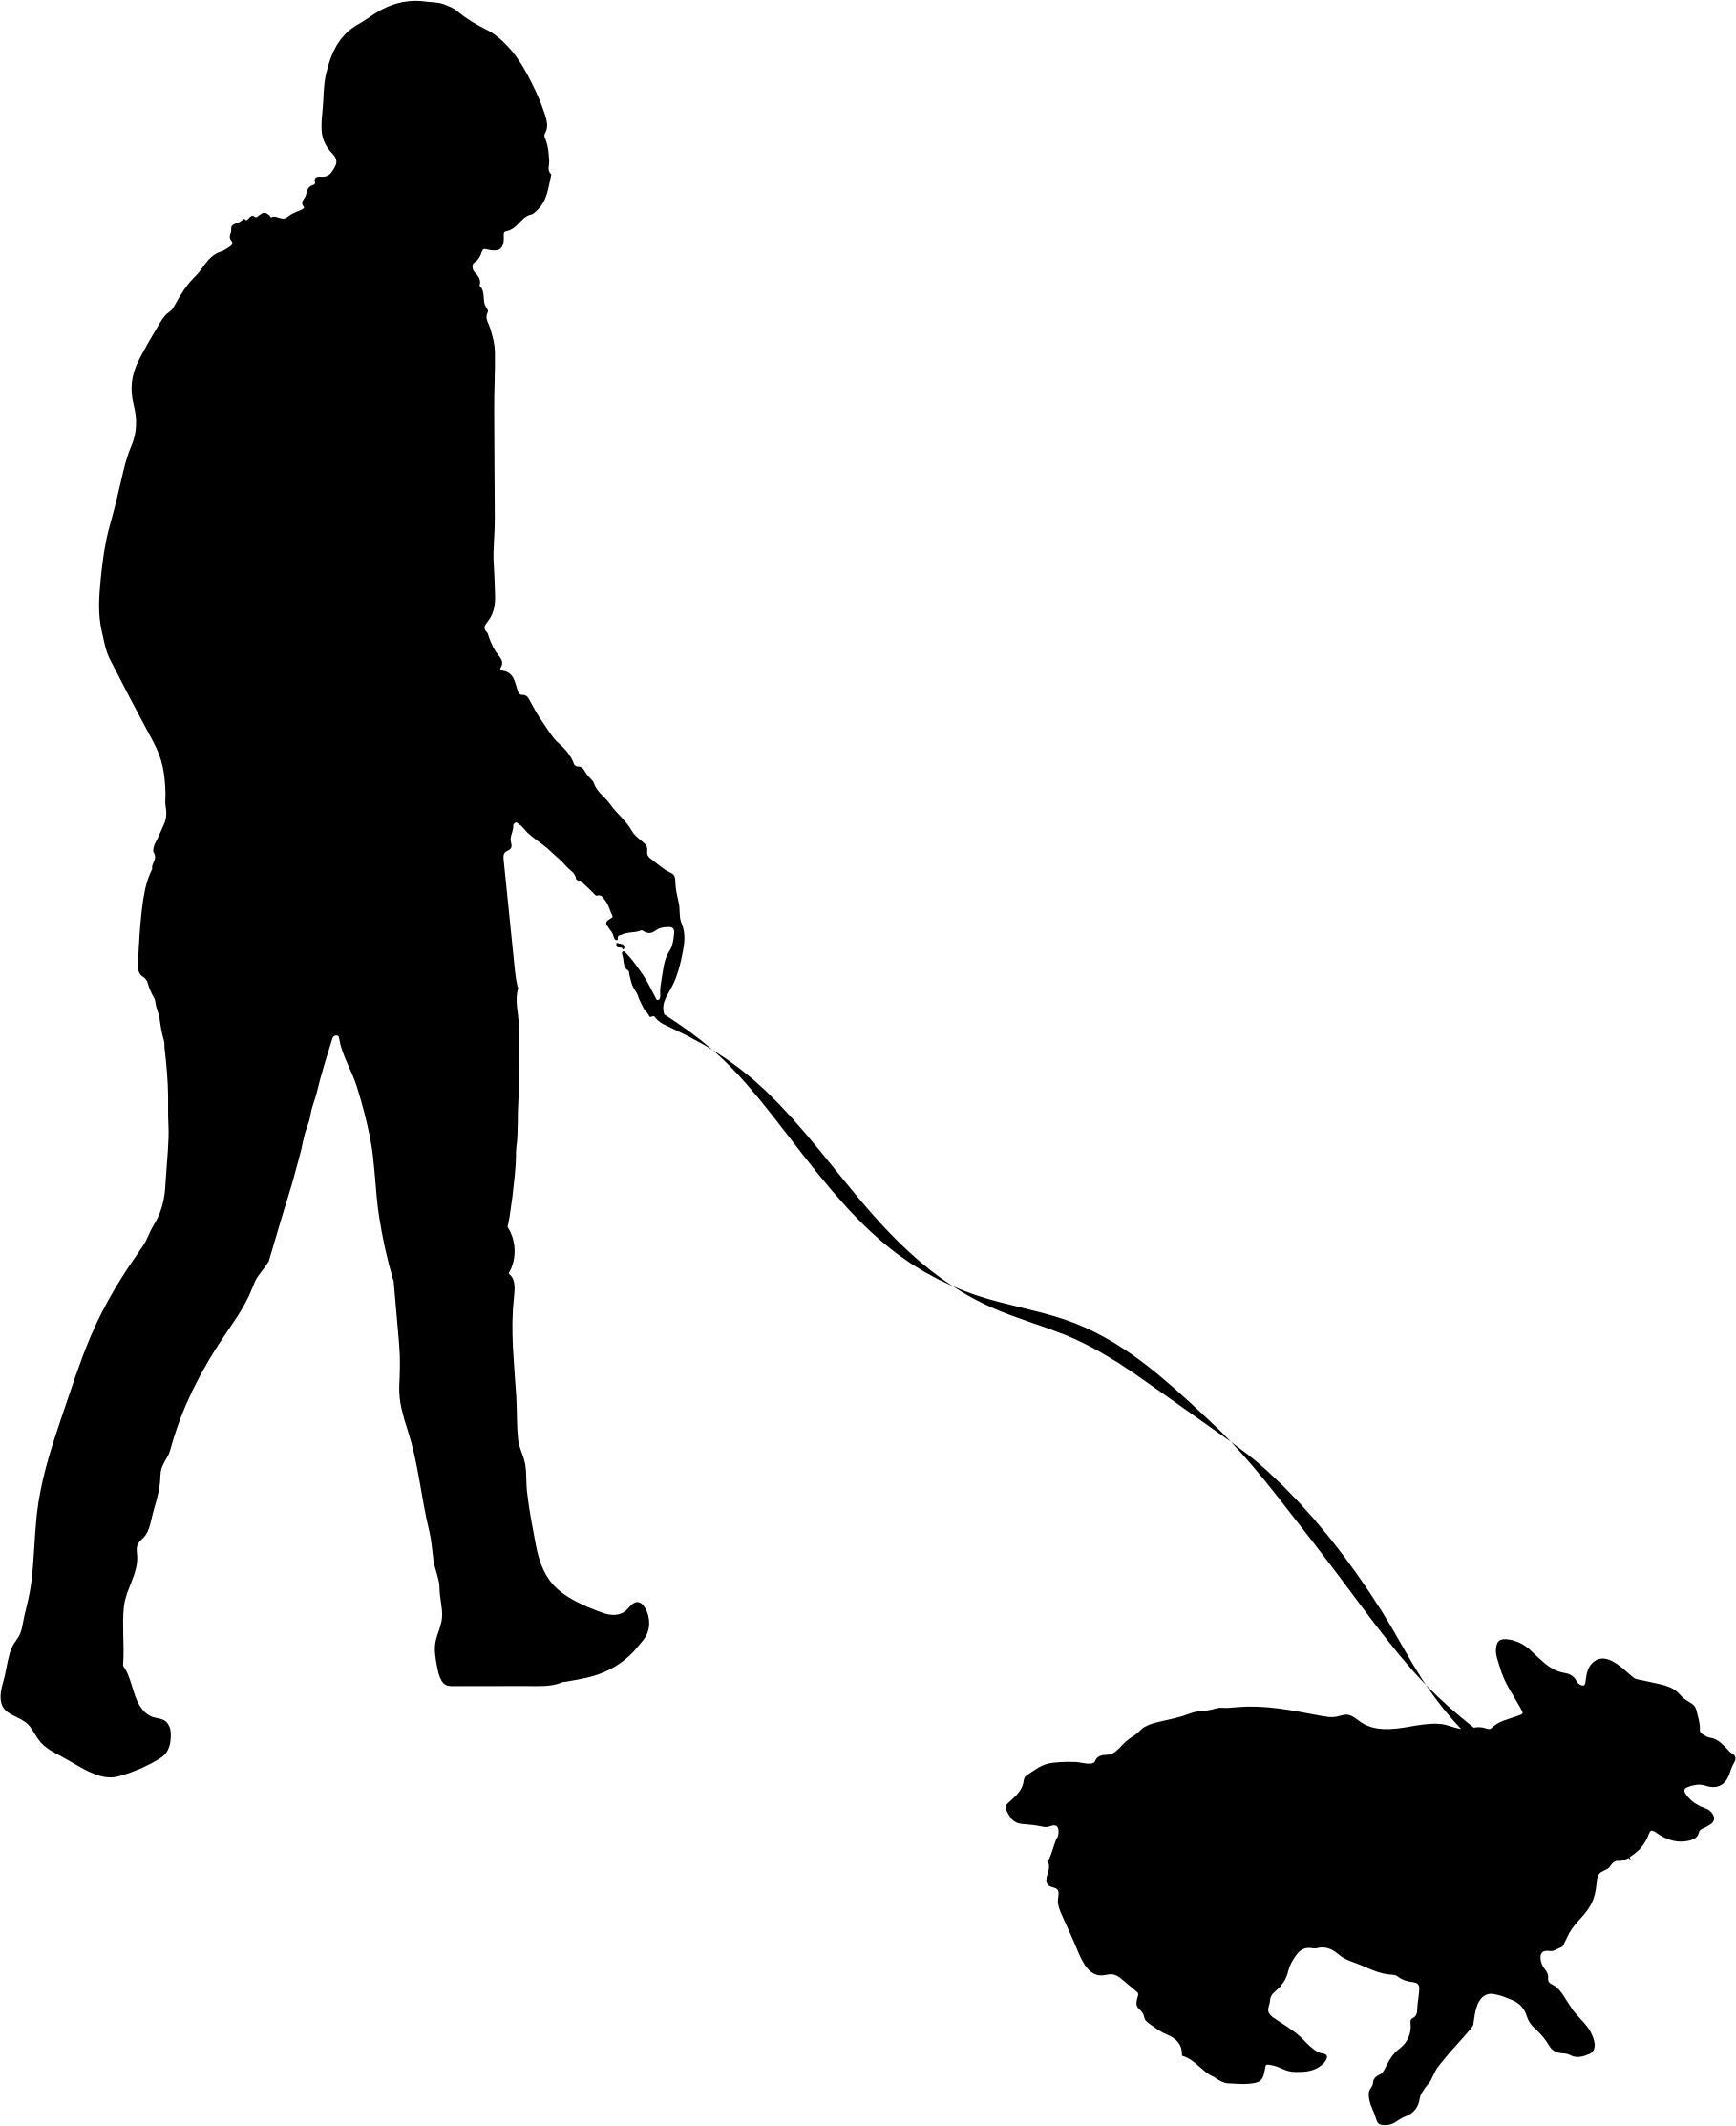 1818x2226 Free Dog Icons Png, Dog Images